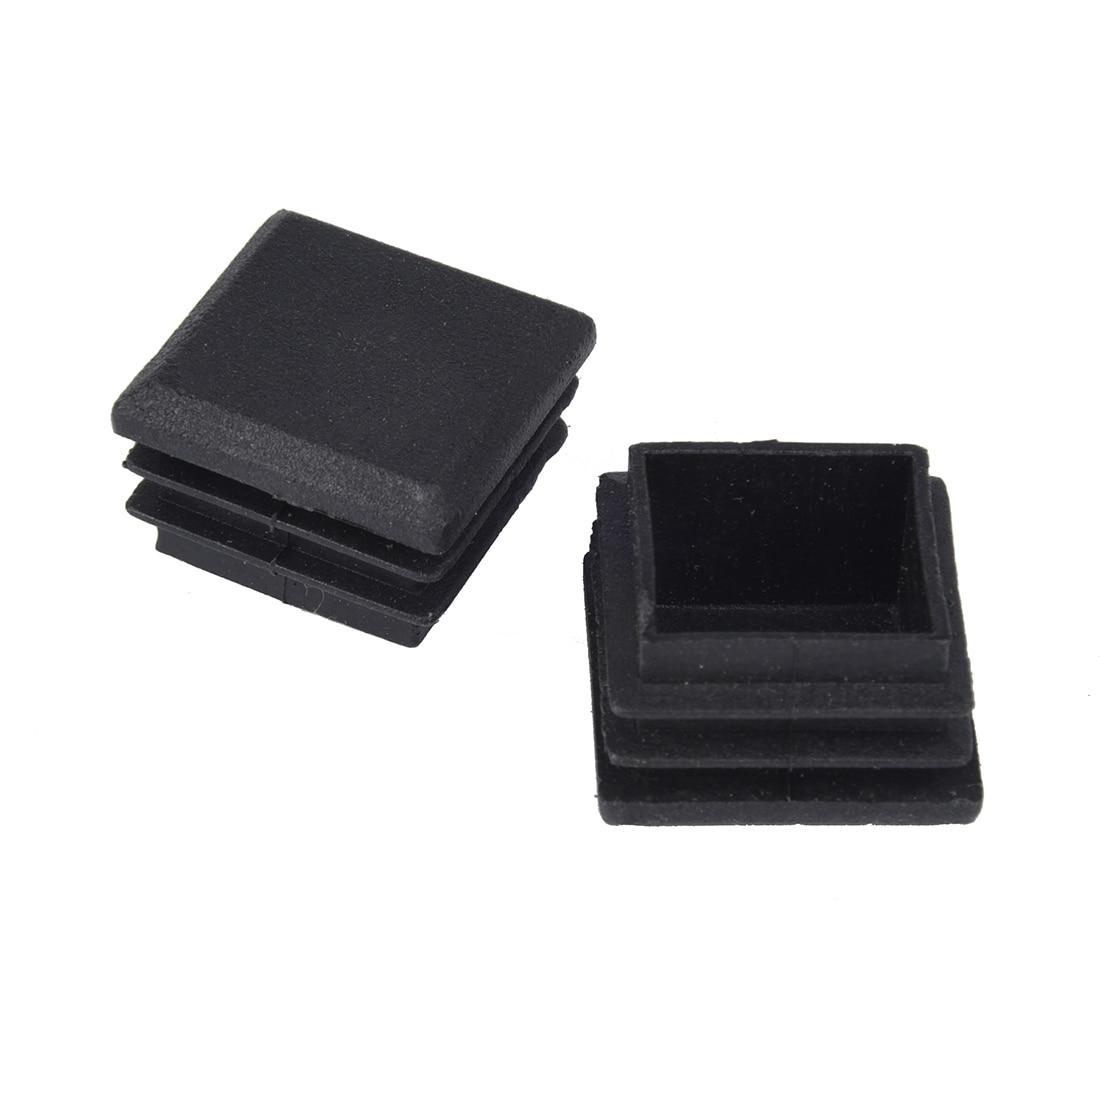 10 Pcs Black Plastic Square Tube Inserts End Blanking Cap 25mm X 25mm